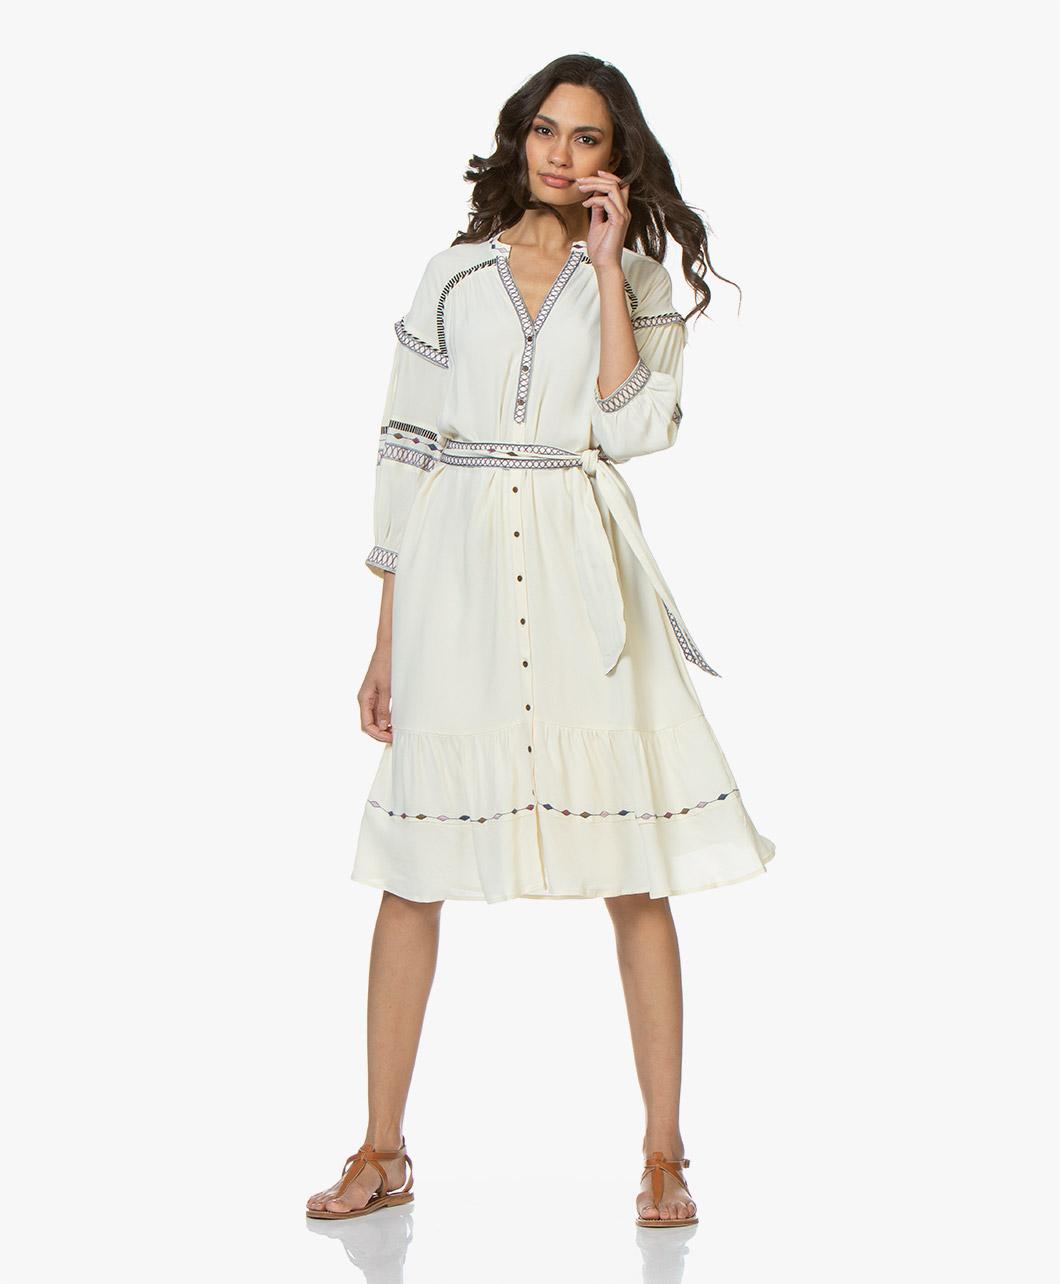 93f3321642f ba sh Patty Embroidered Crepe Shirt Dress - Off-white - 1e19patt off